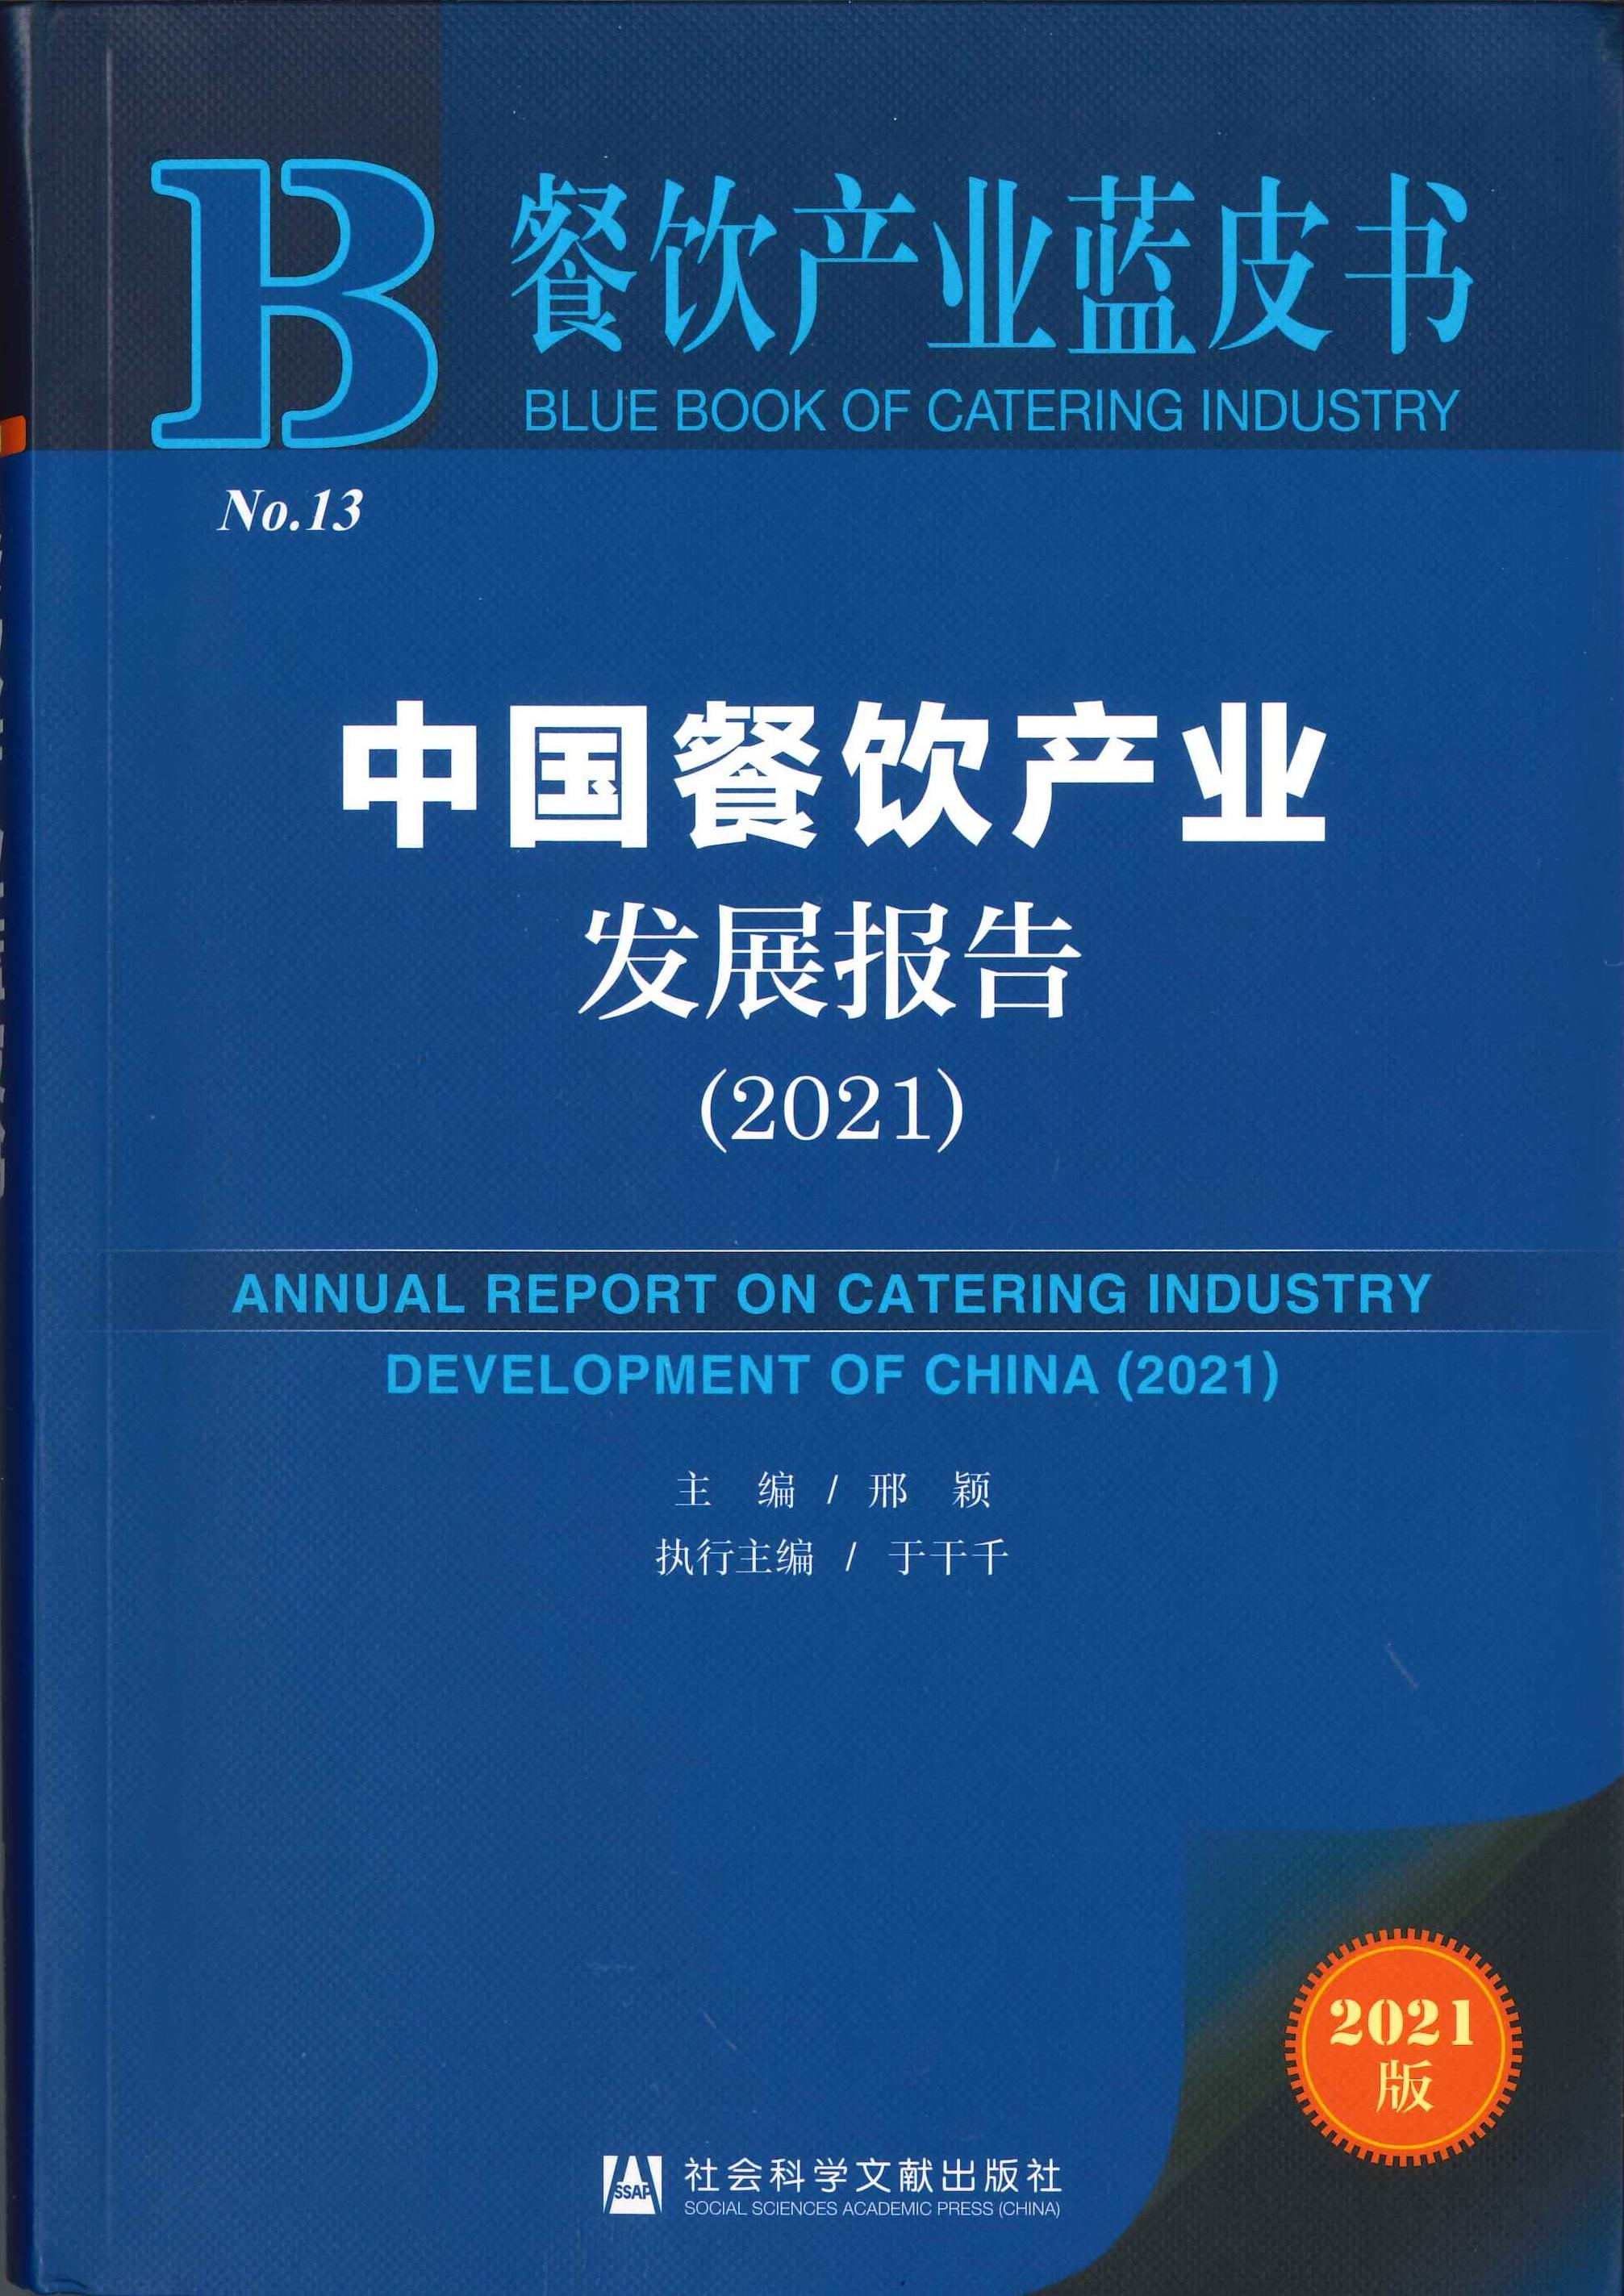 中国餐饮产业发展报告=Annual report on catering industry development of China